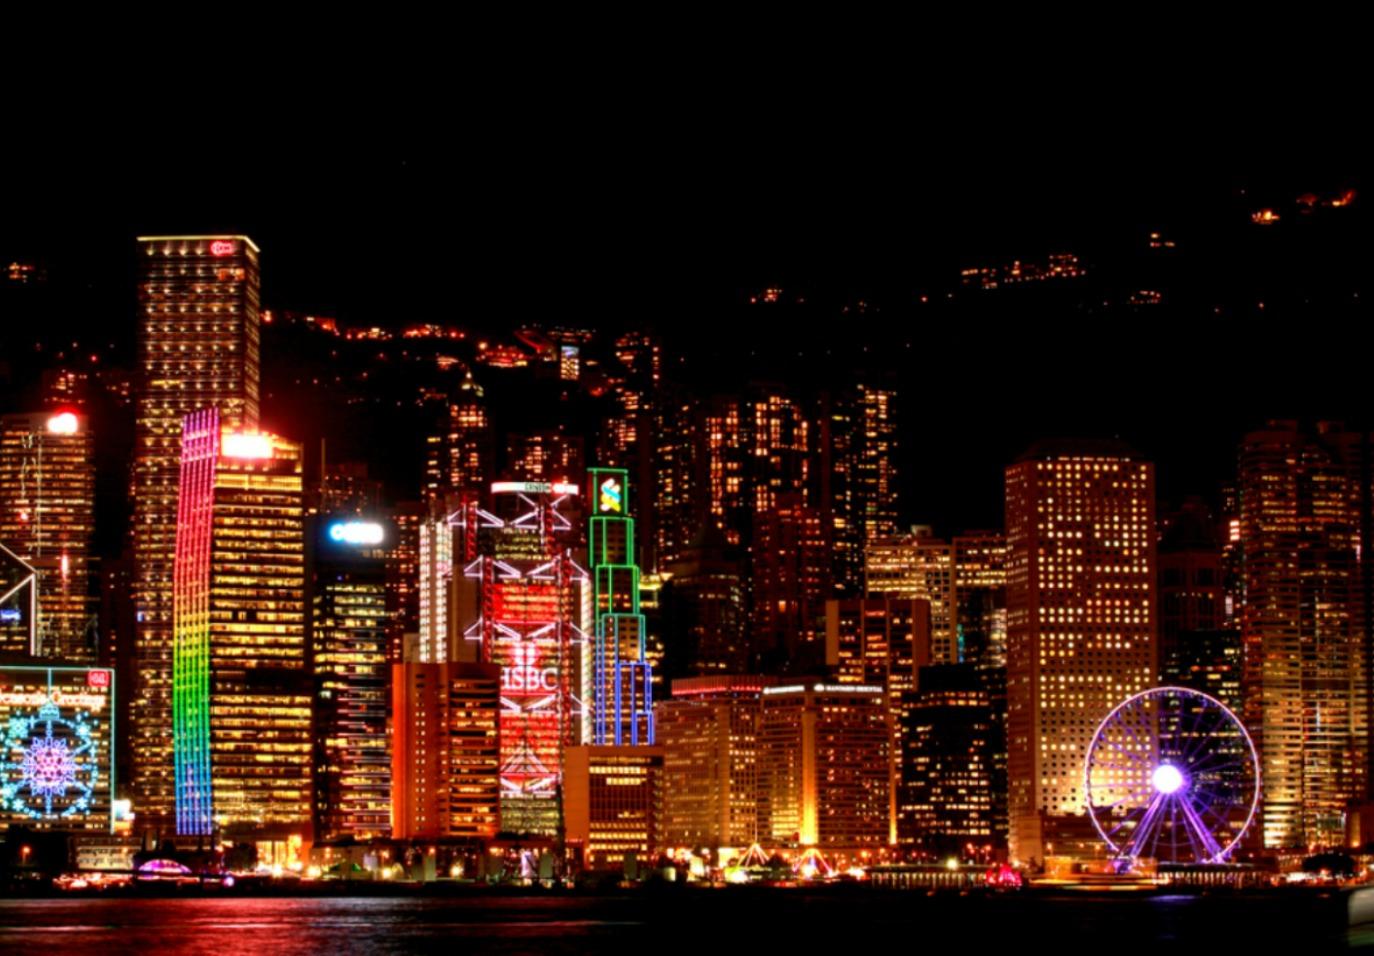 Hong Kong Macau Tour Package for Couple - 6 Nights 7 Days